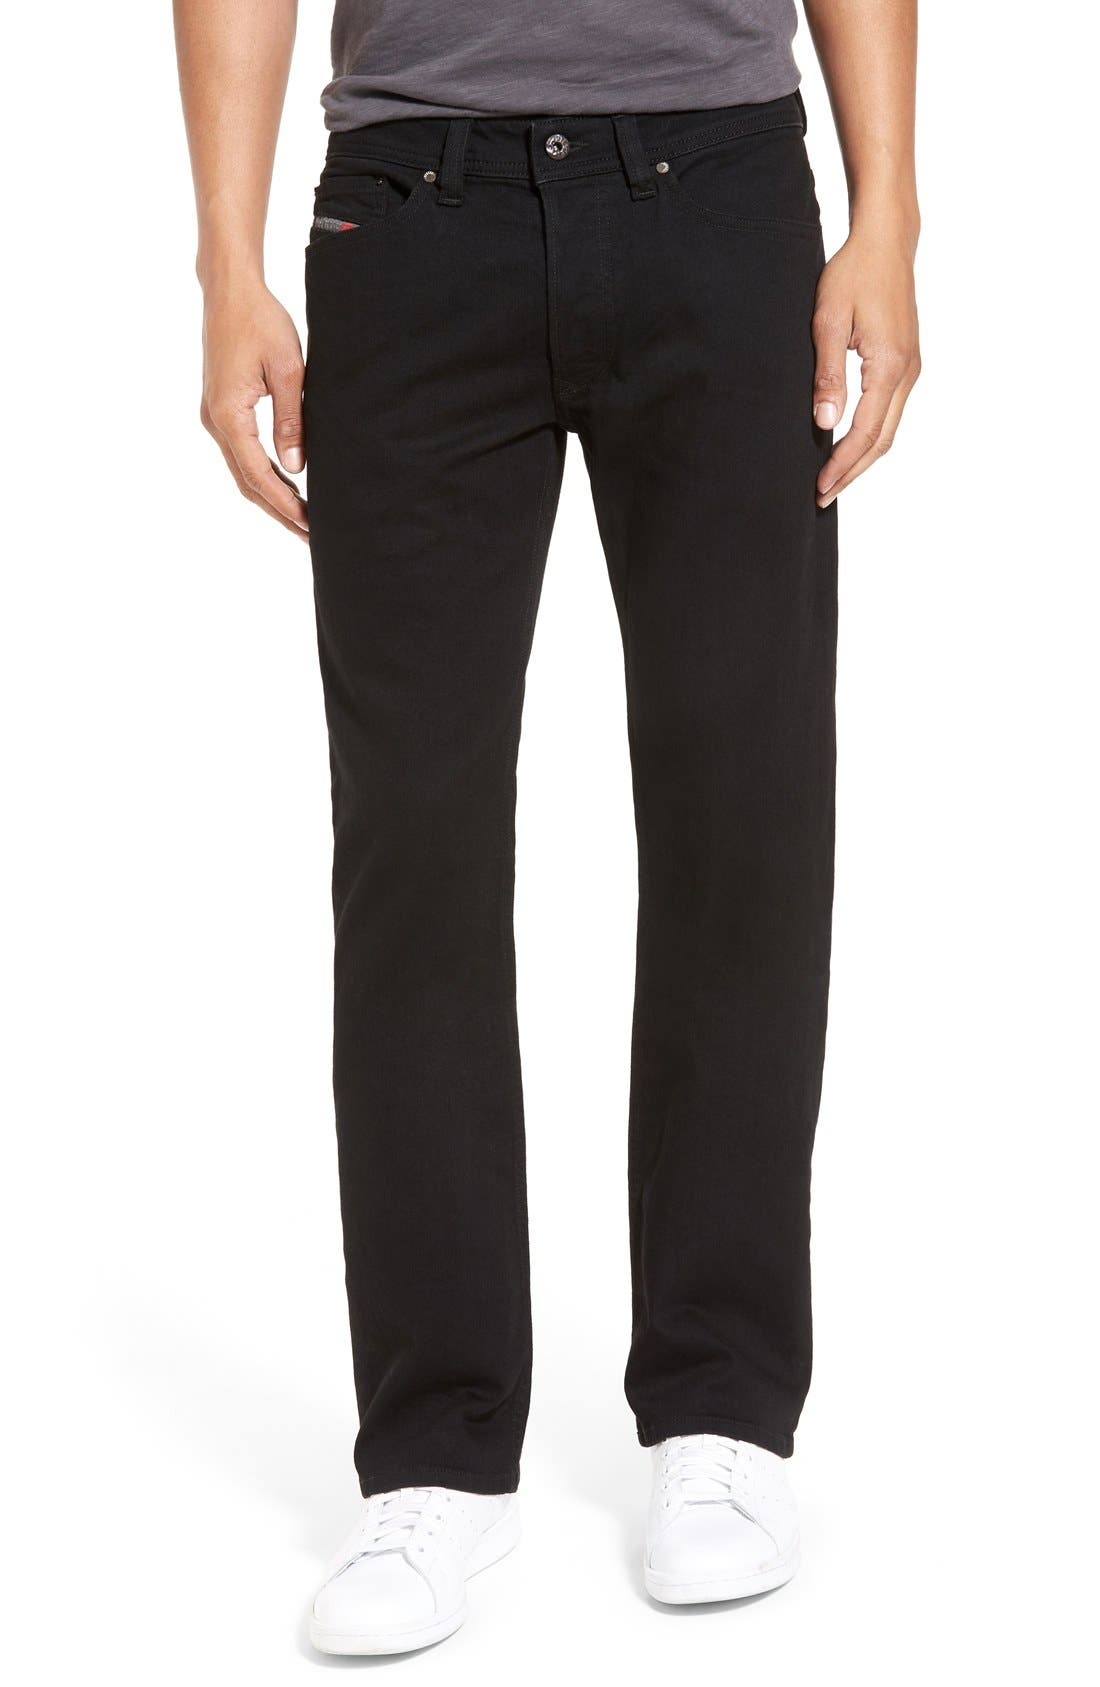 'Viker' Straight Fit Jeans,                             Main thumbnail 1, color,                             008